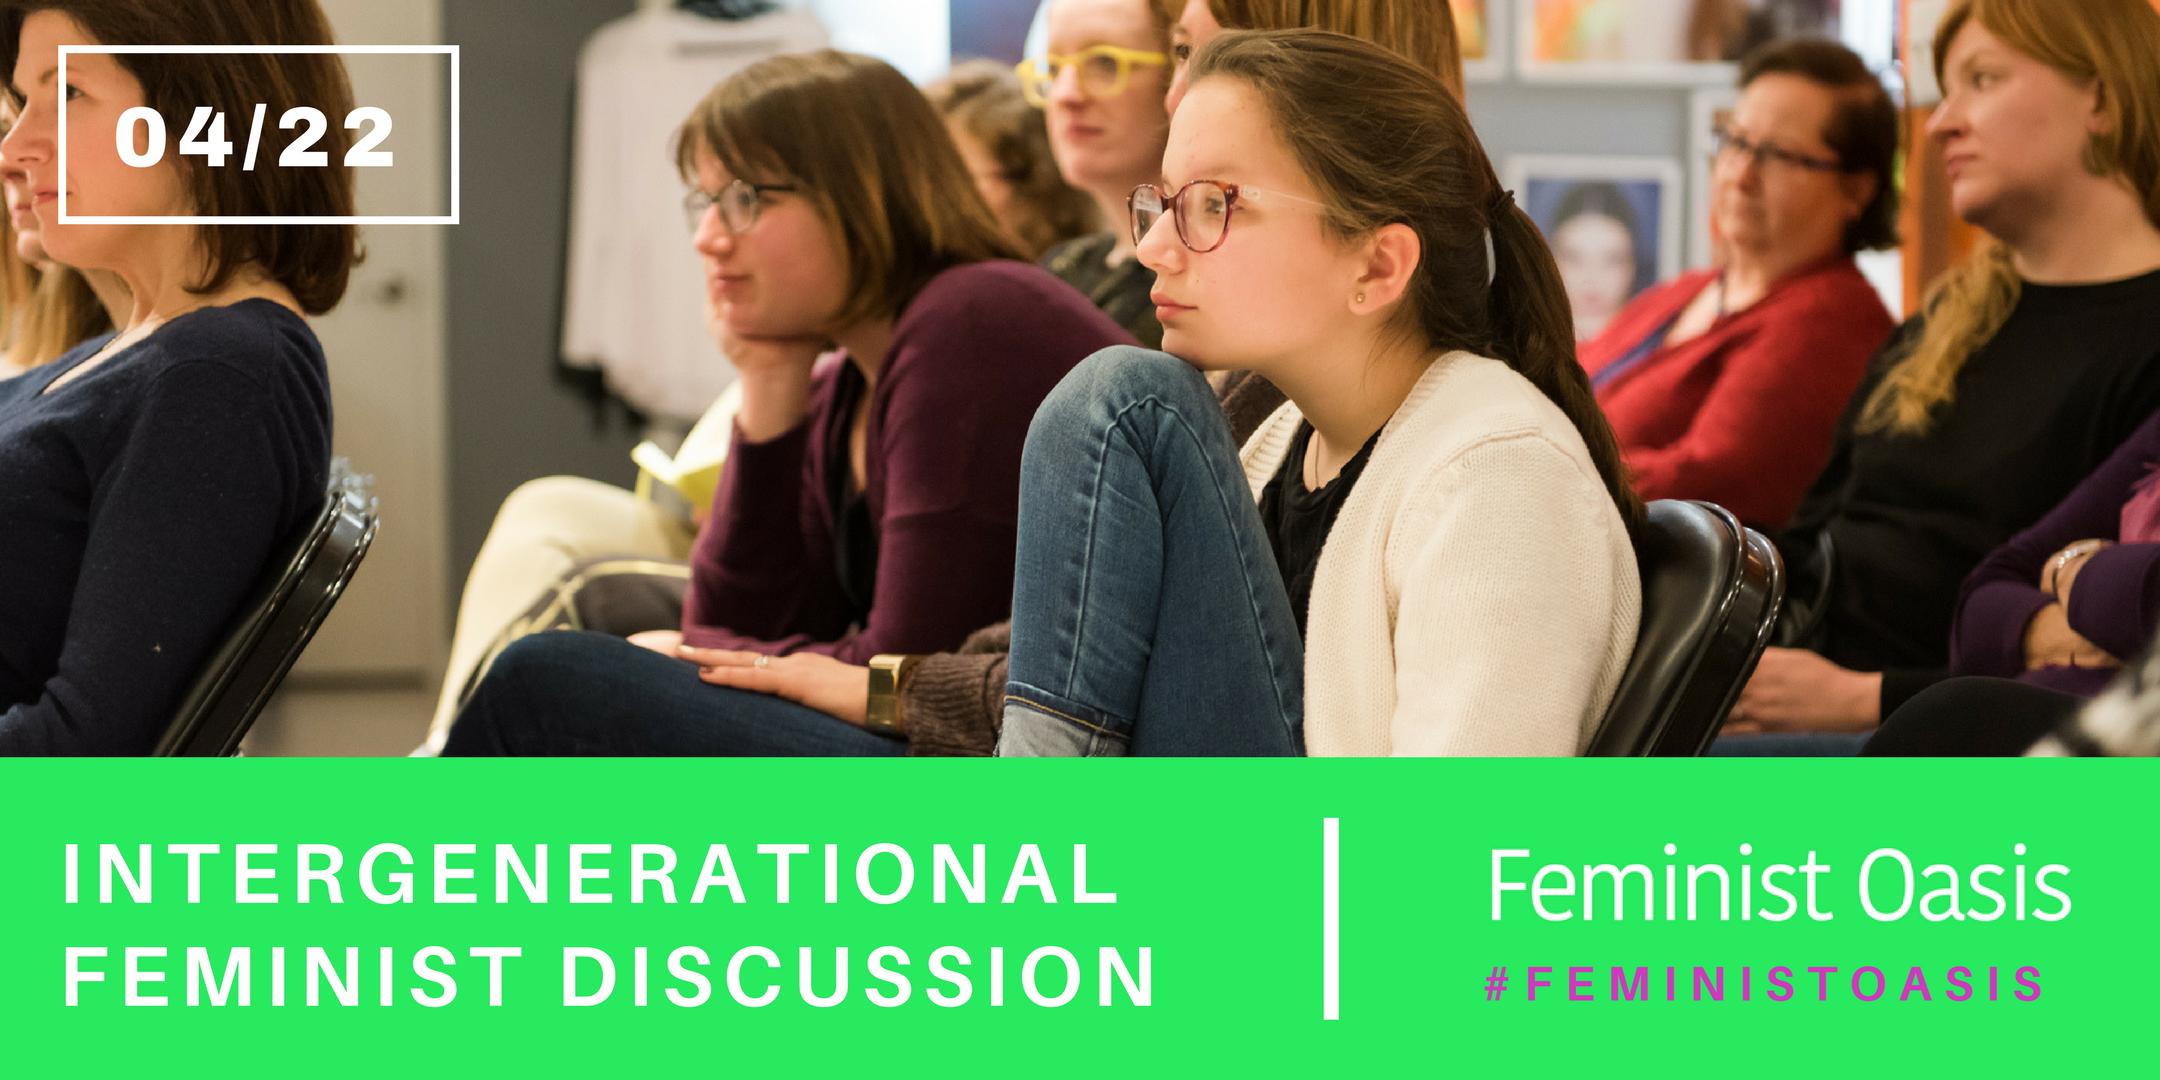 Intergenerational-Feminist-Discussion.png